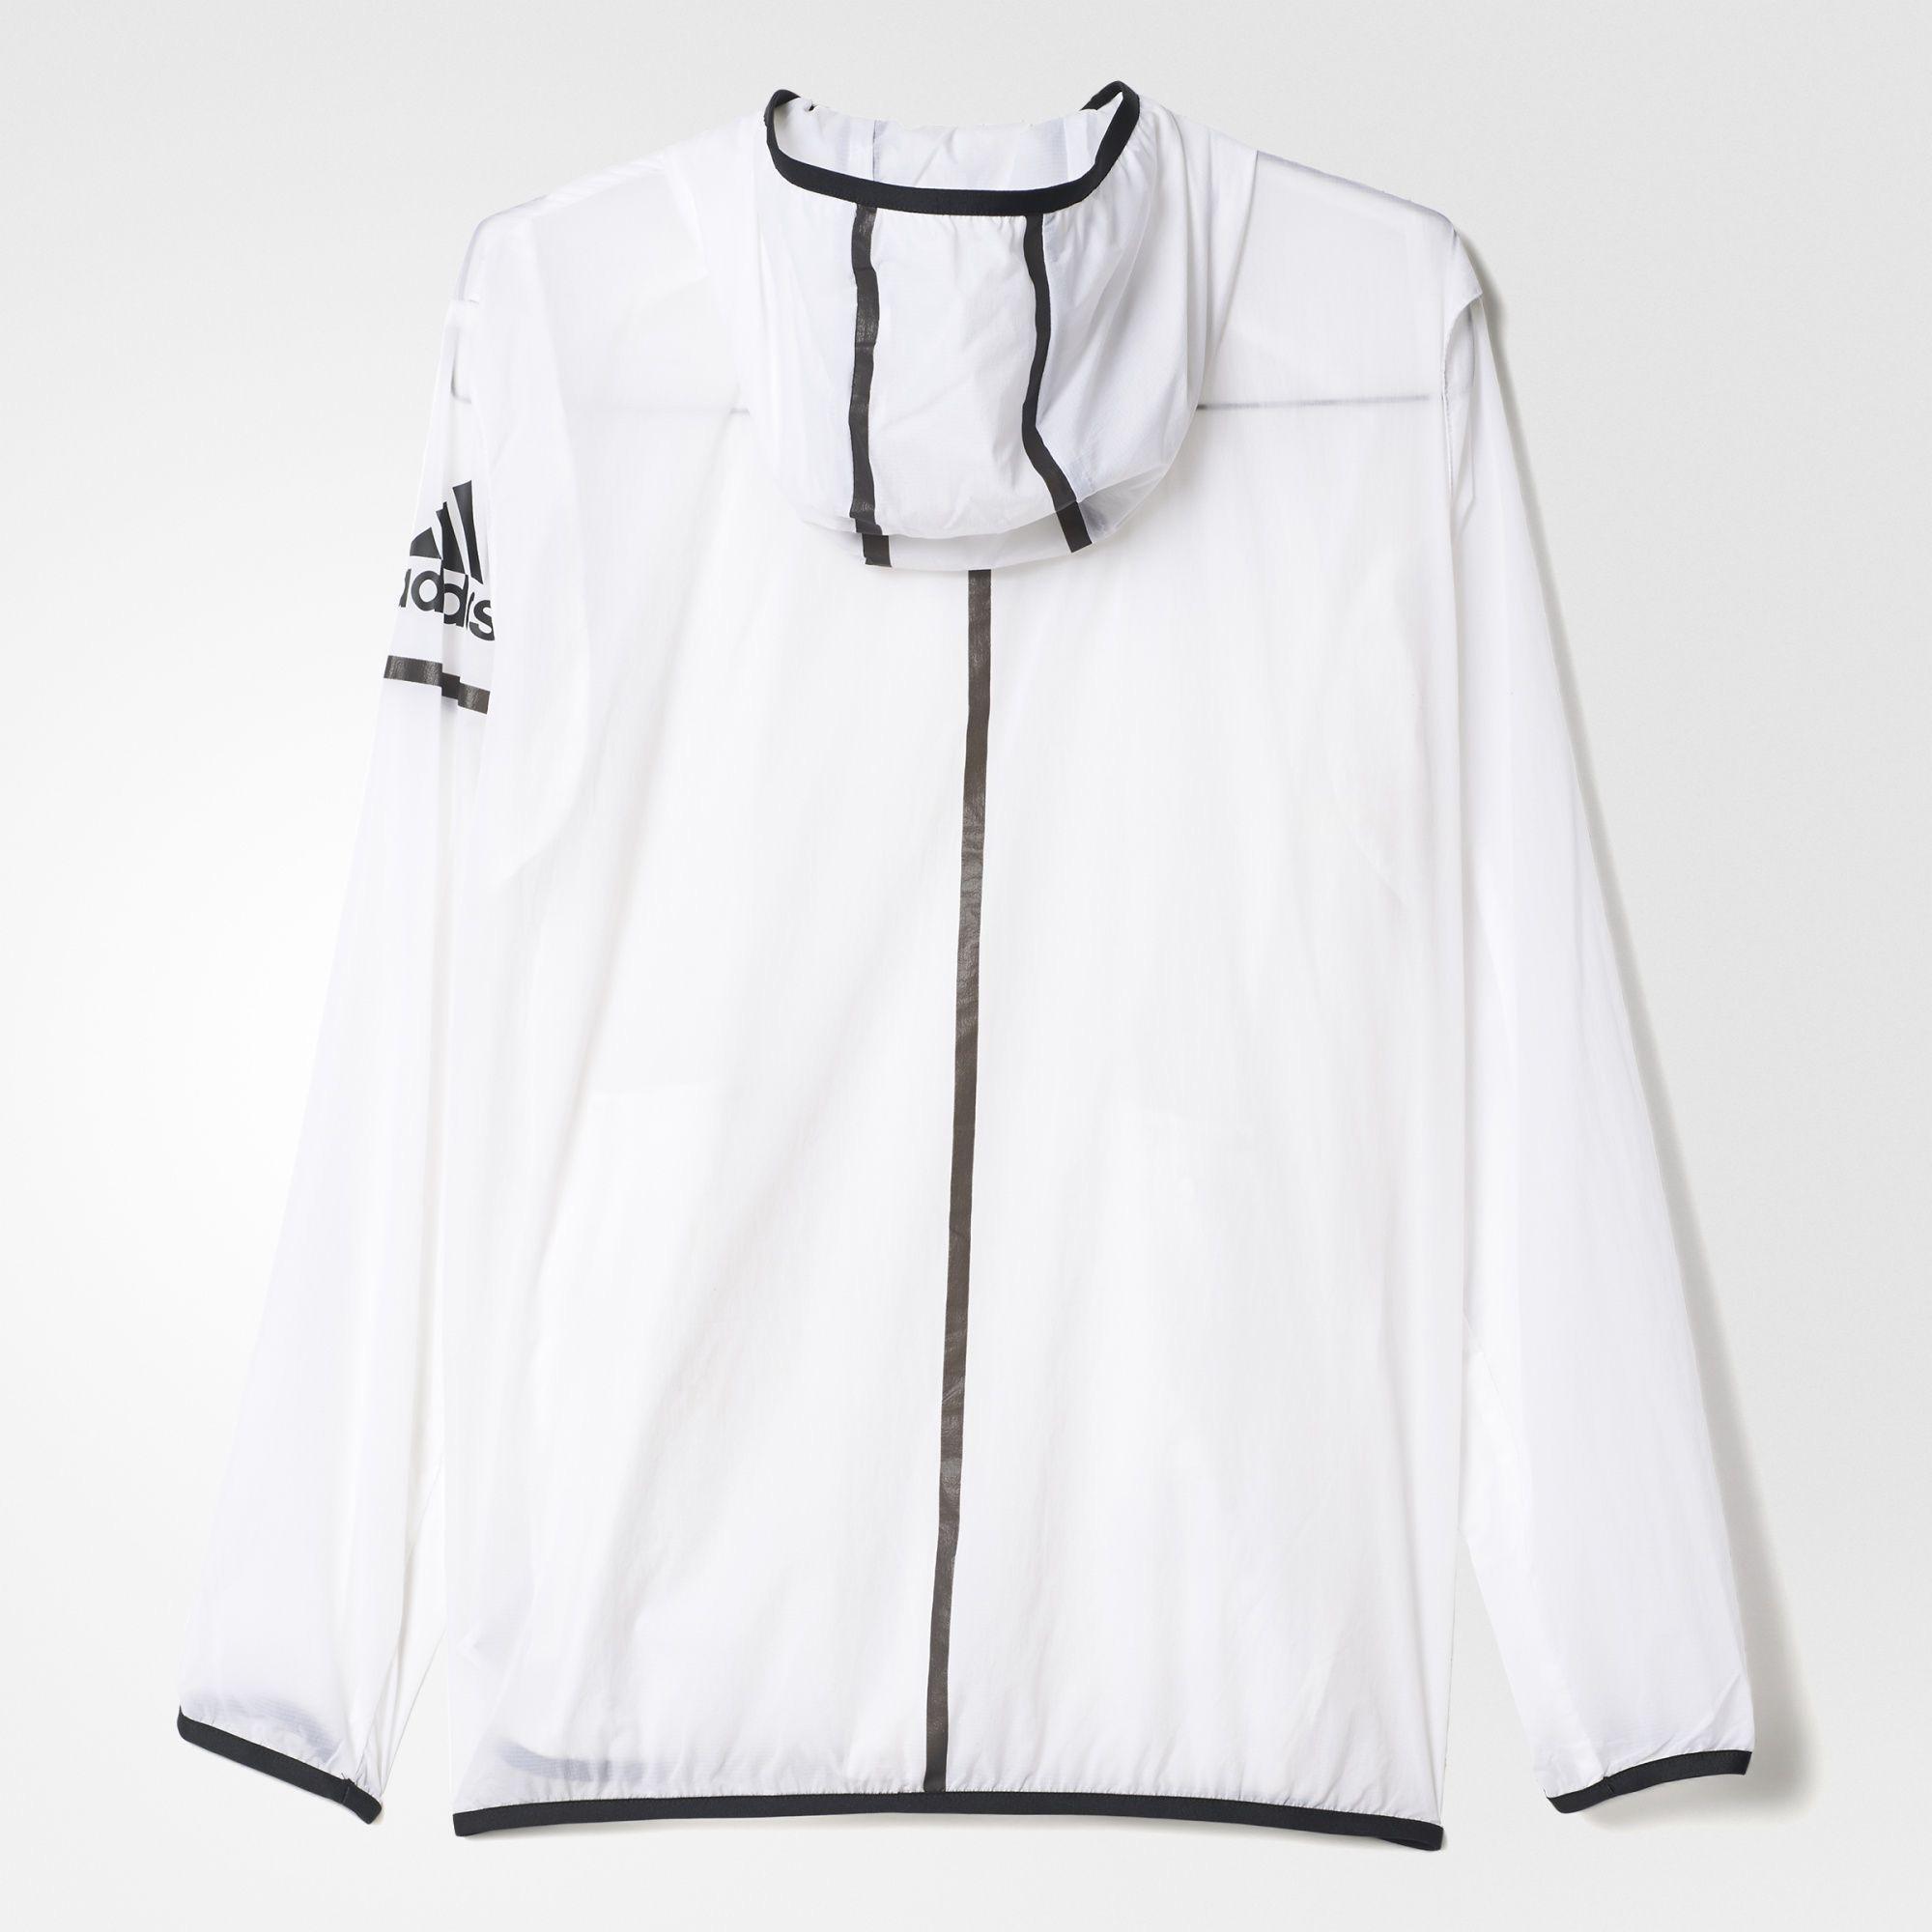 Adidas Mens Daybreaker Wind Jacket